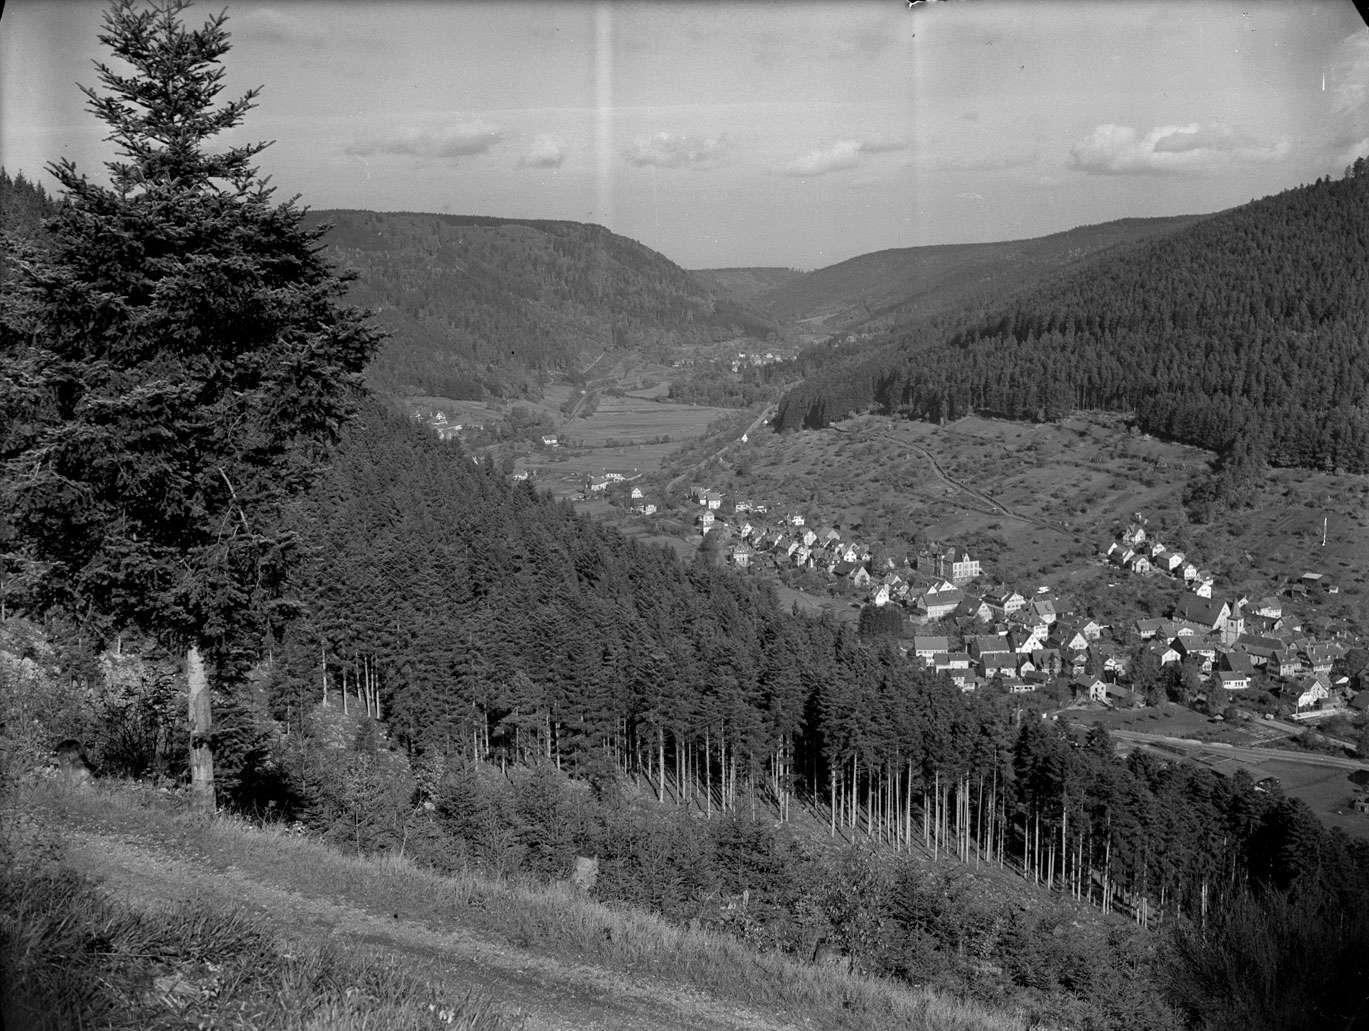 Dokumentation Wildbad und Calmbach (2), Nr 003